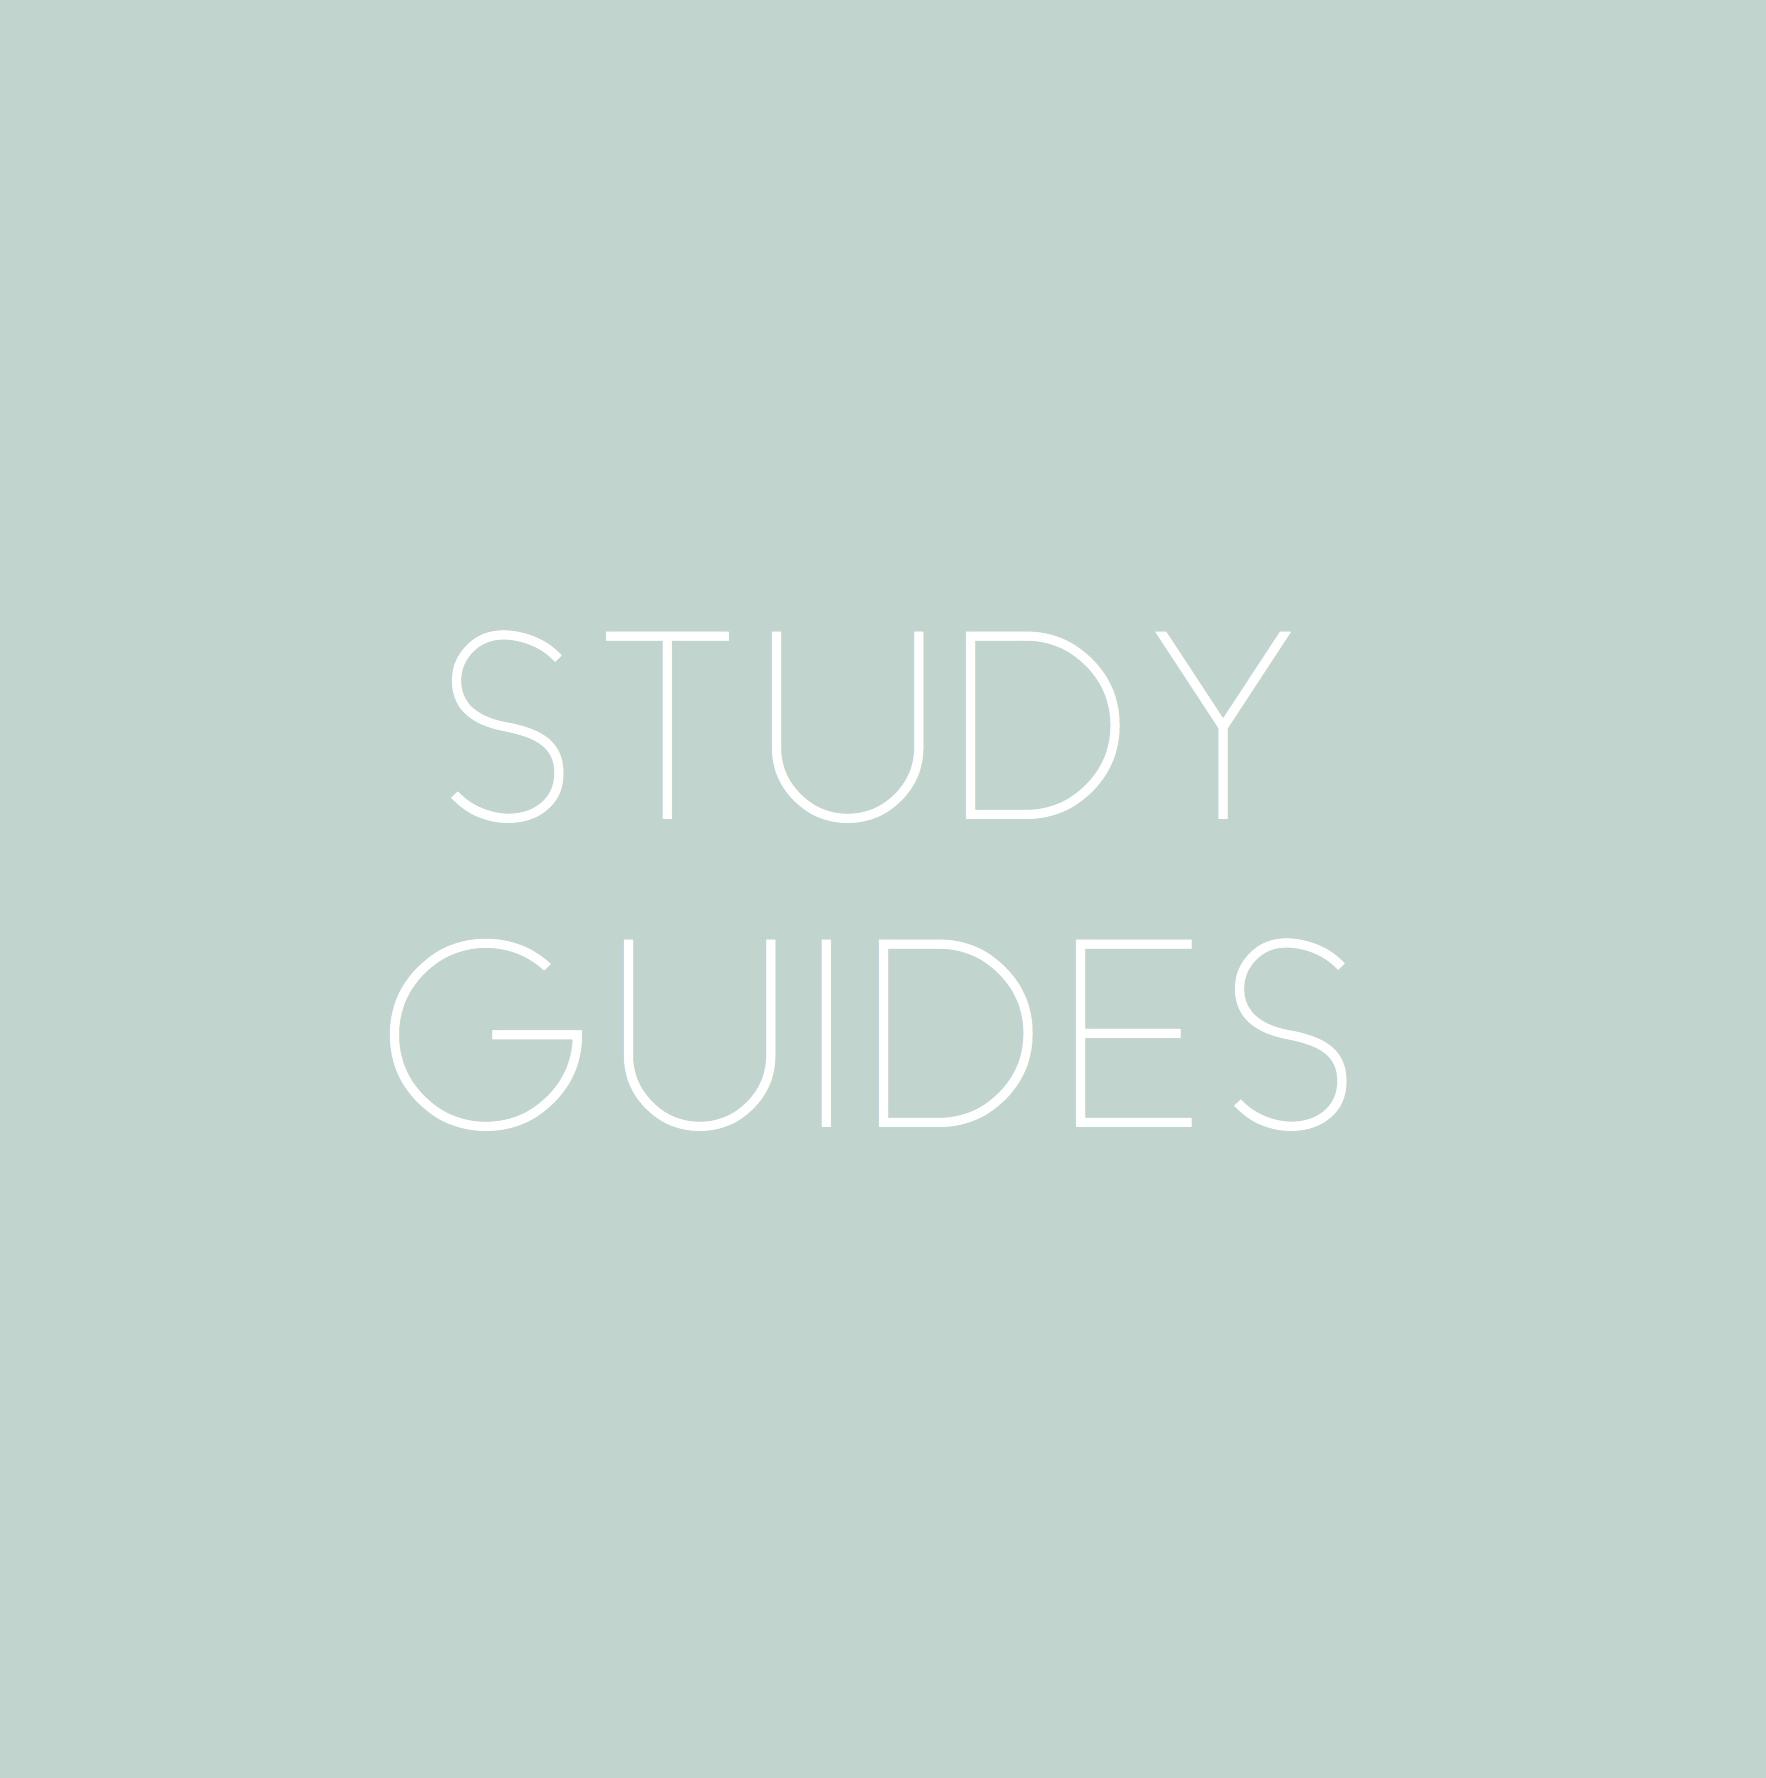 atlas STUDY GUIDES1.jpg